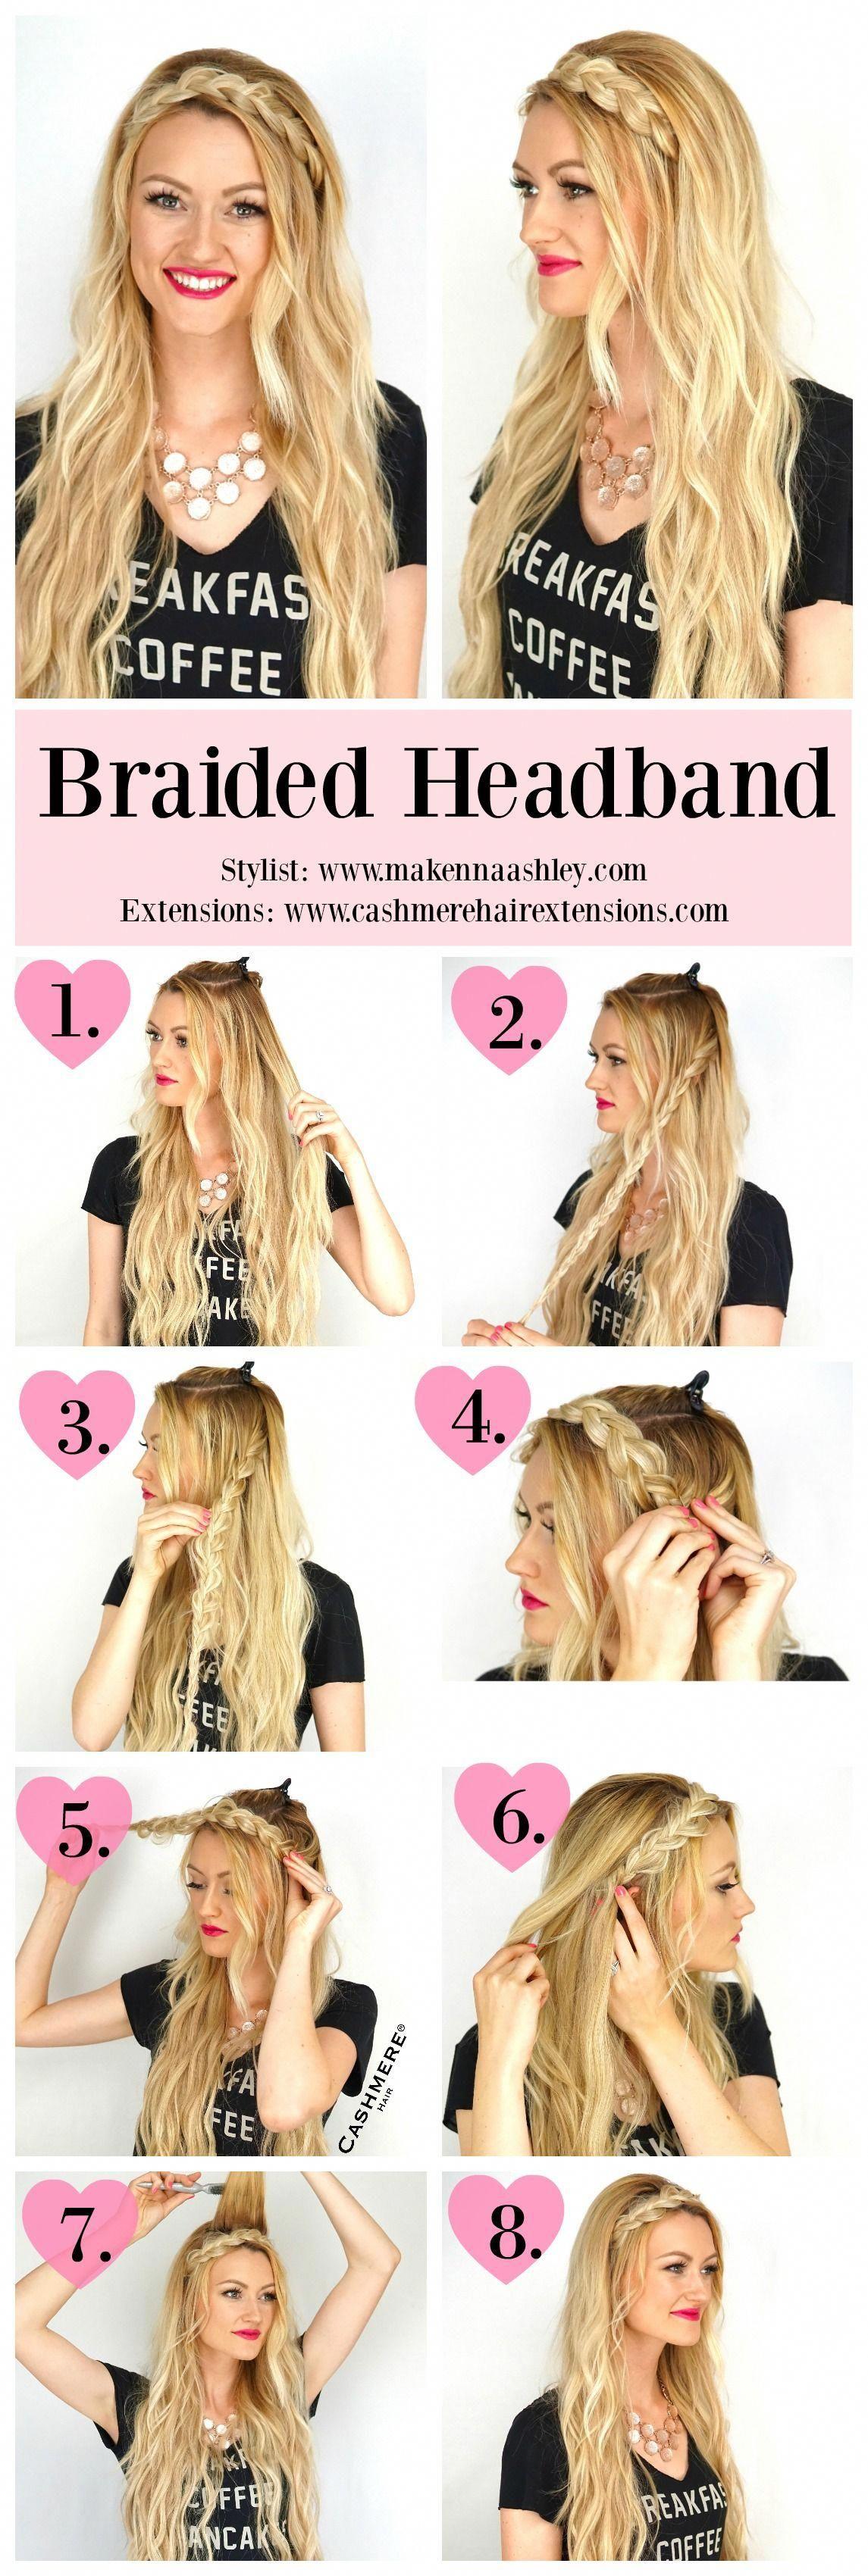 Braided headband tutorial cashmere hair clip in